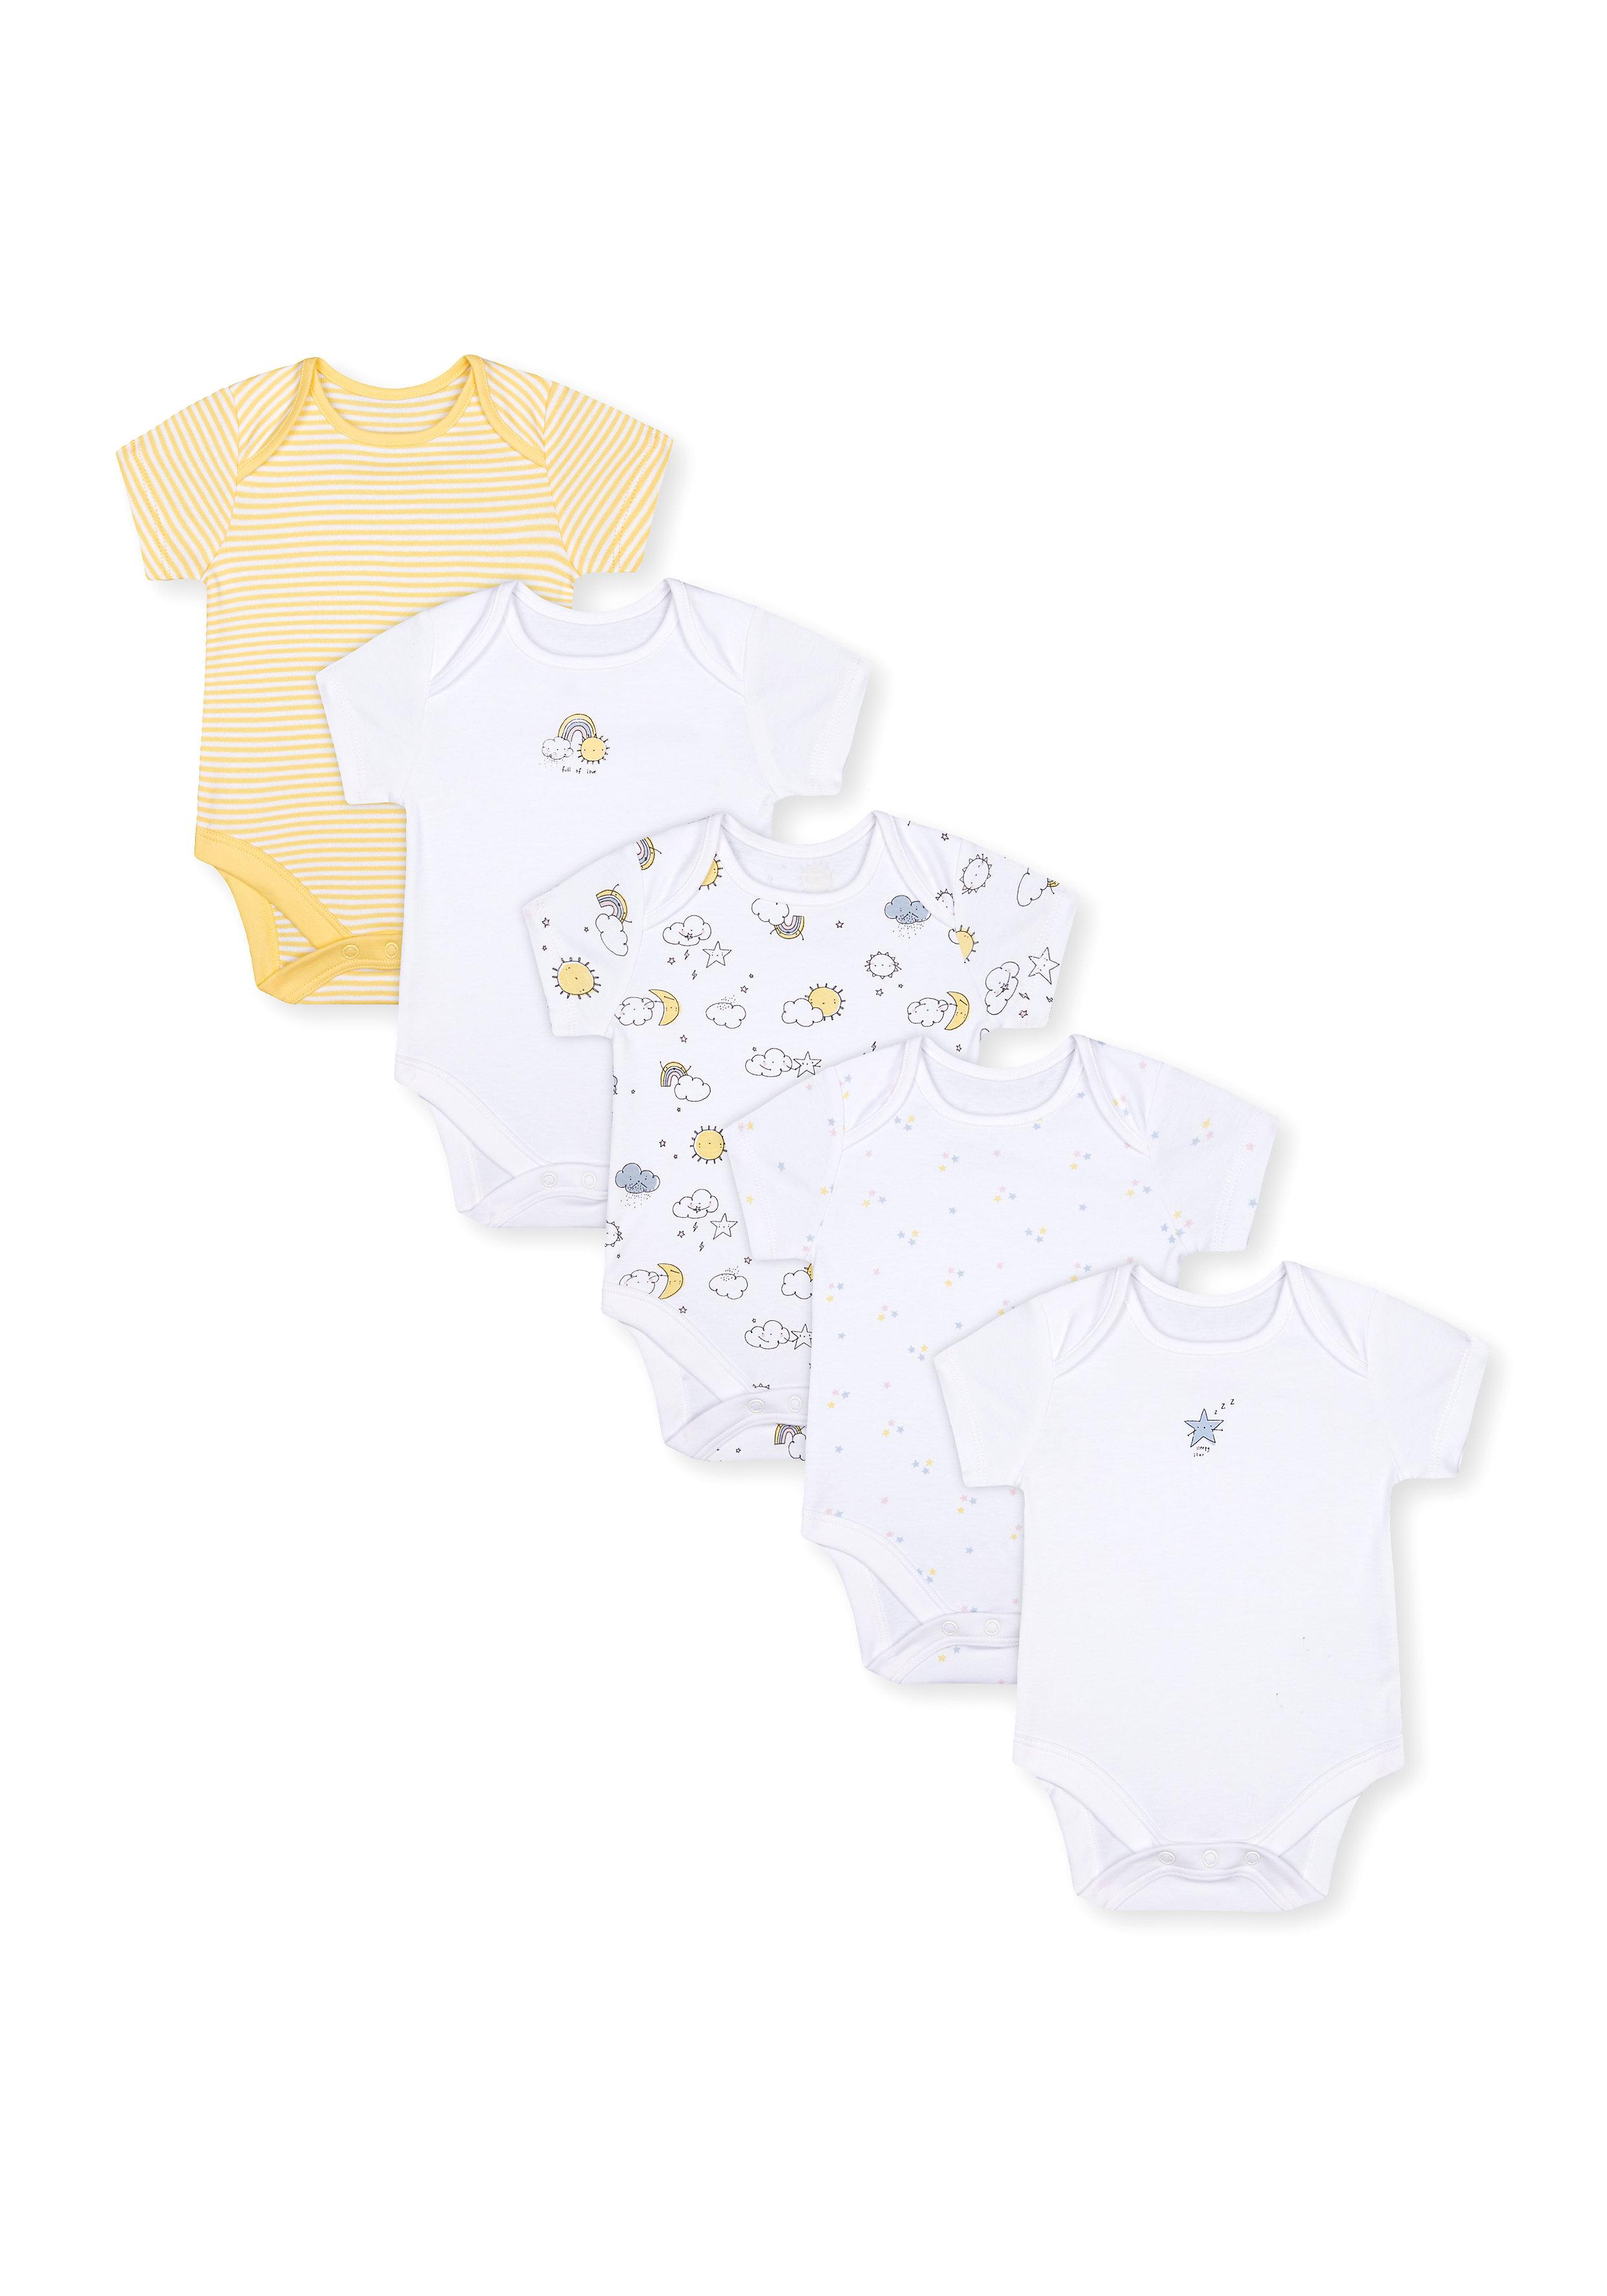 Mothercare | Unisex Half Sleeves Bodysuit - Pack Of 5 - Yellow